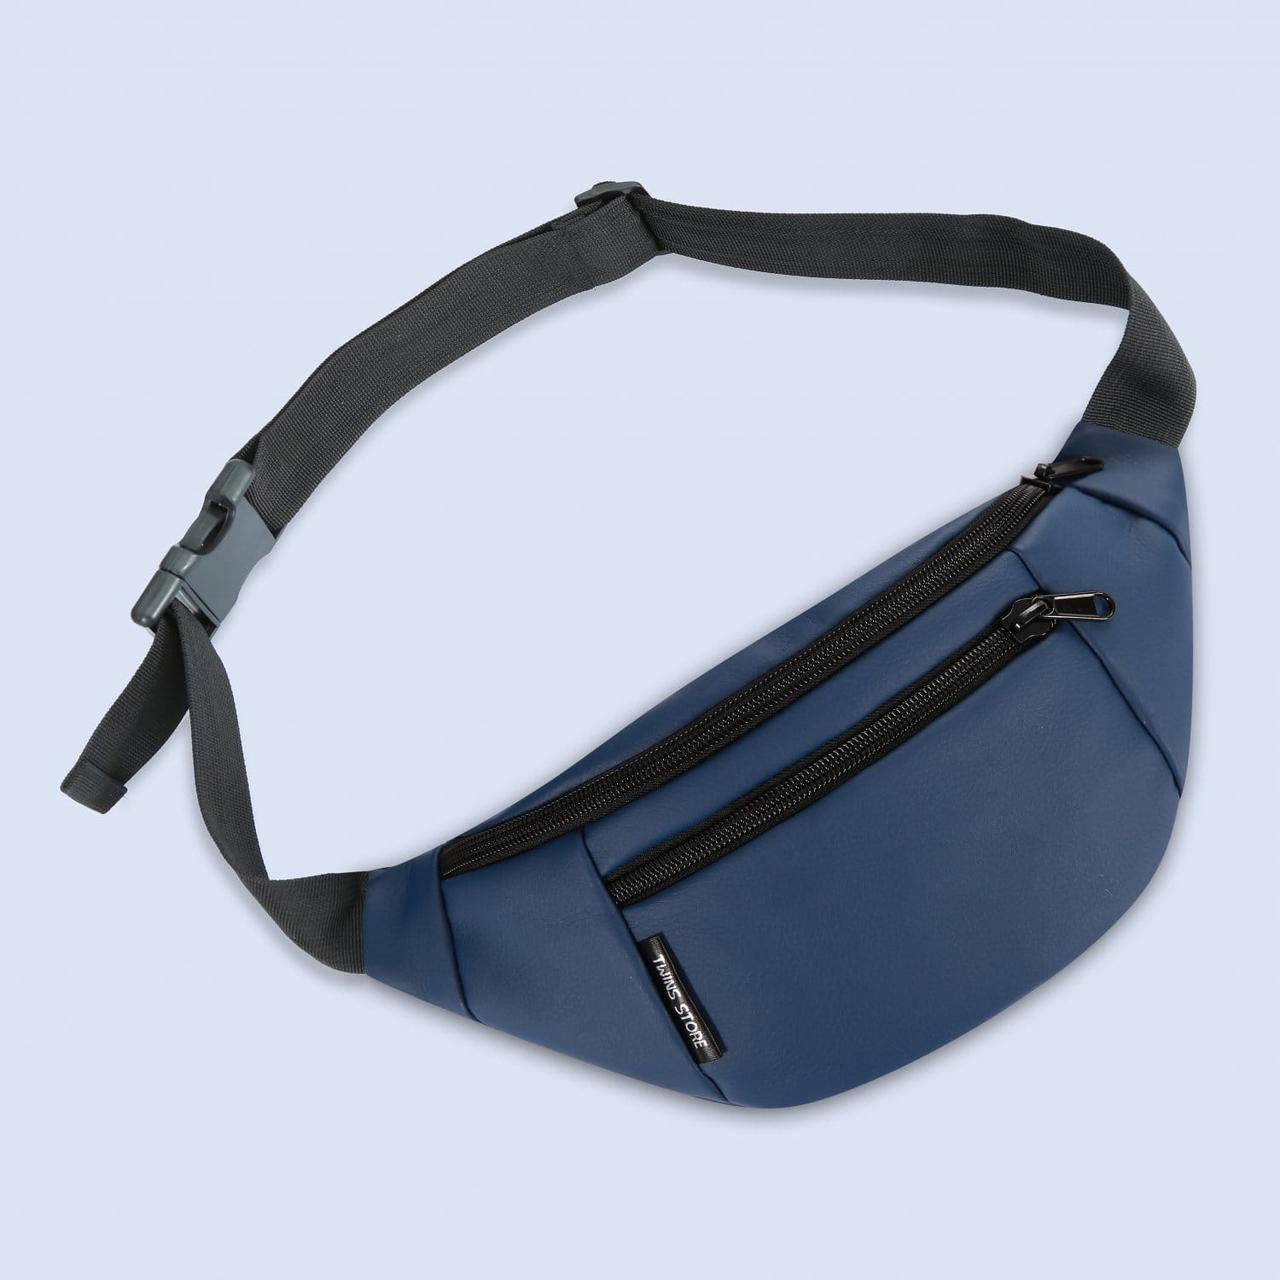 Поясная сумка Twins эко-кожа синяя